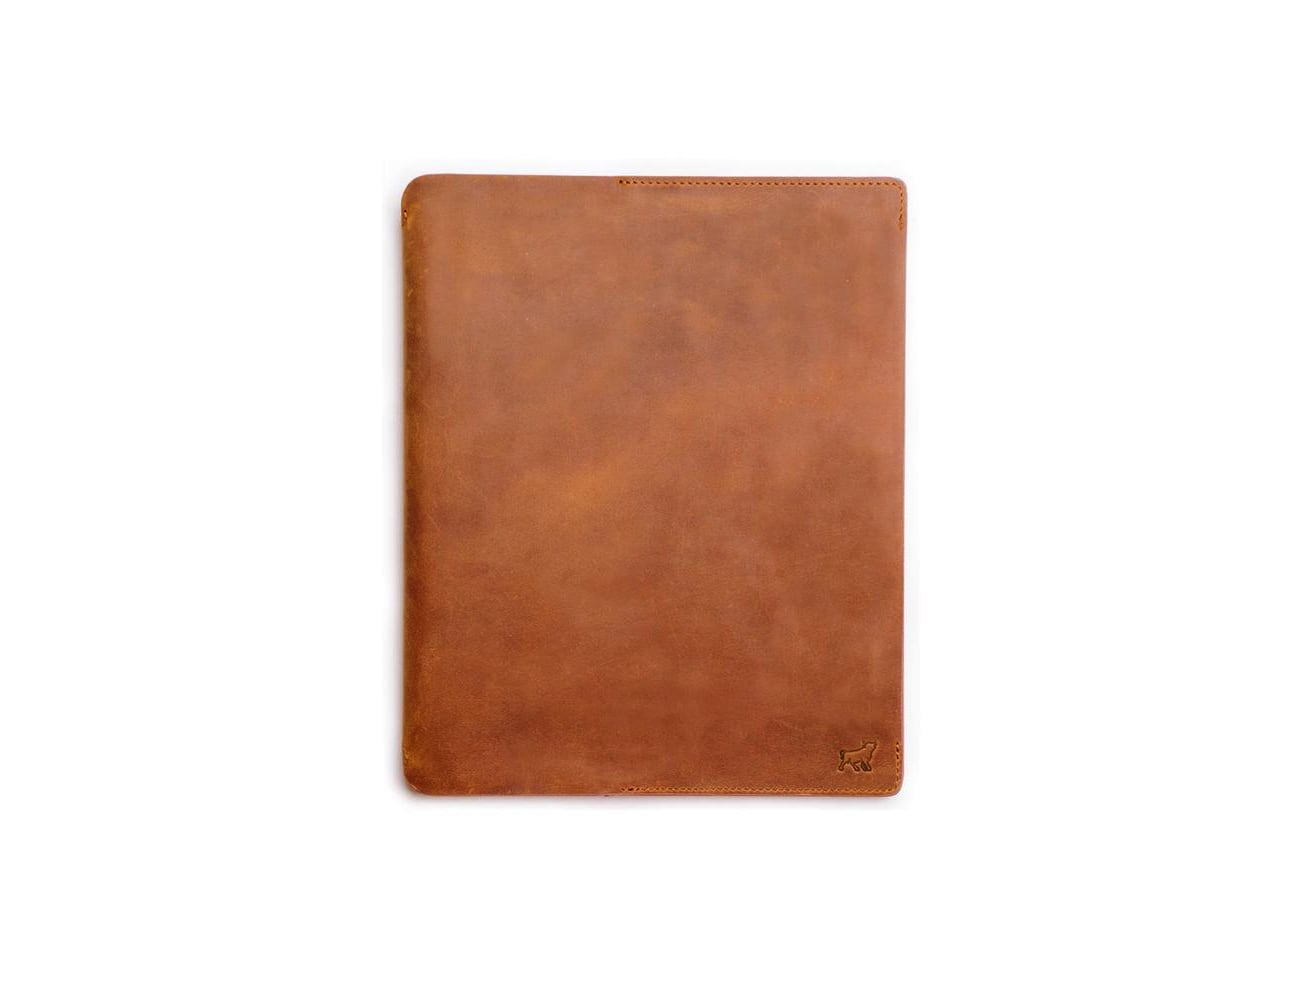 Bull & Stash Allison Full-Sized Leather Portfolio